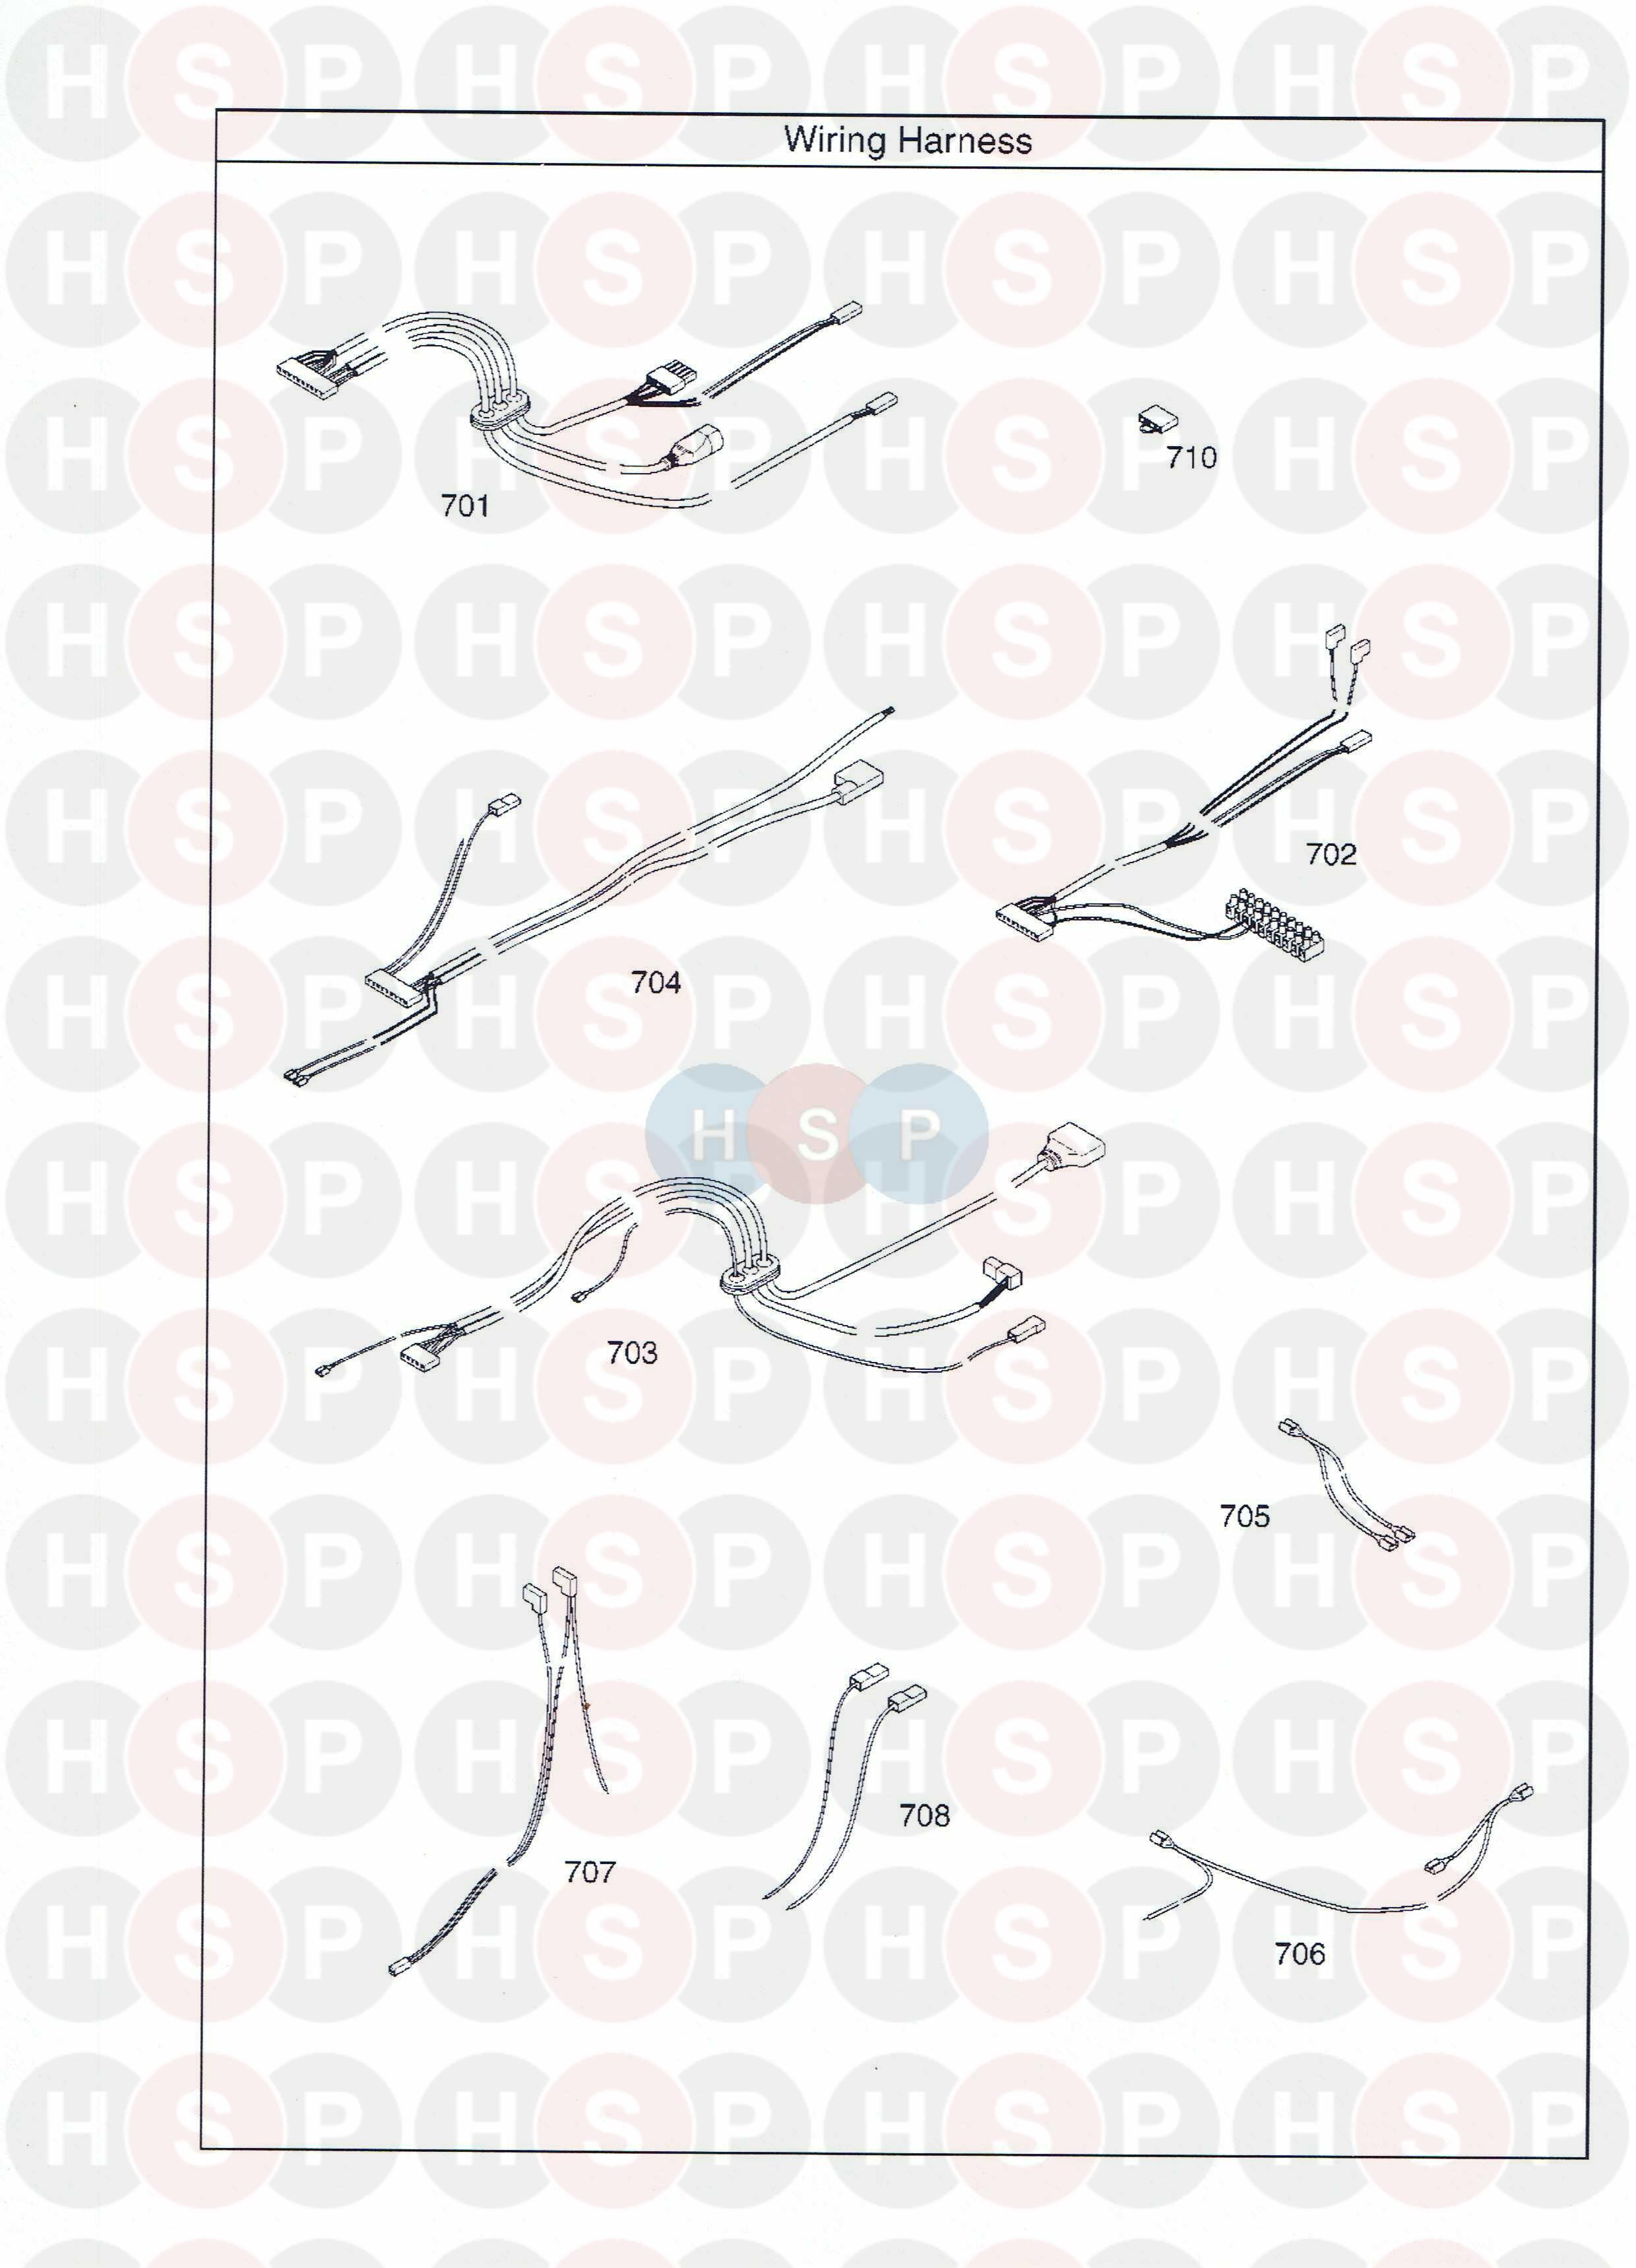 potterton gold system 18 he boiler diagram  wiring harness